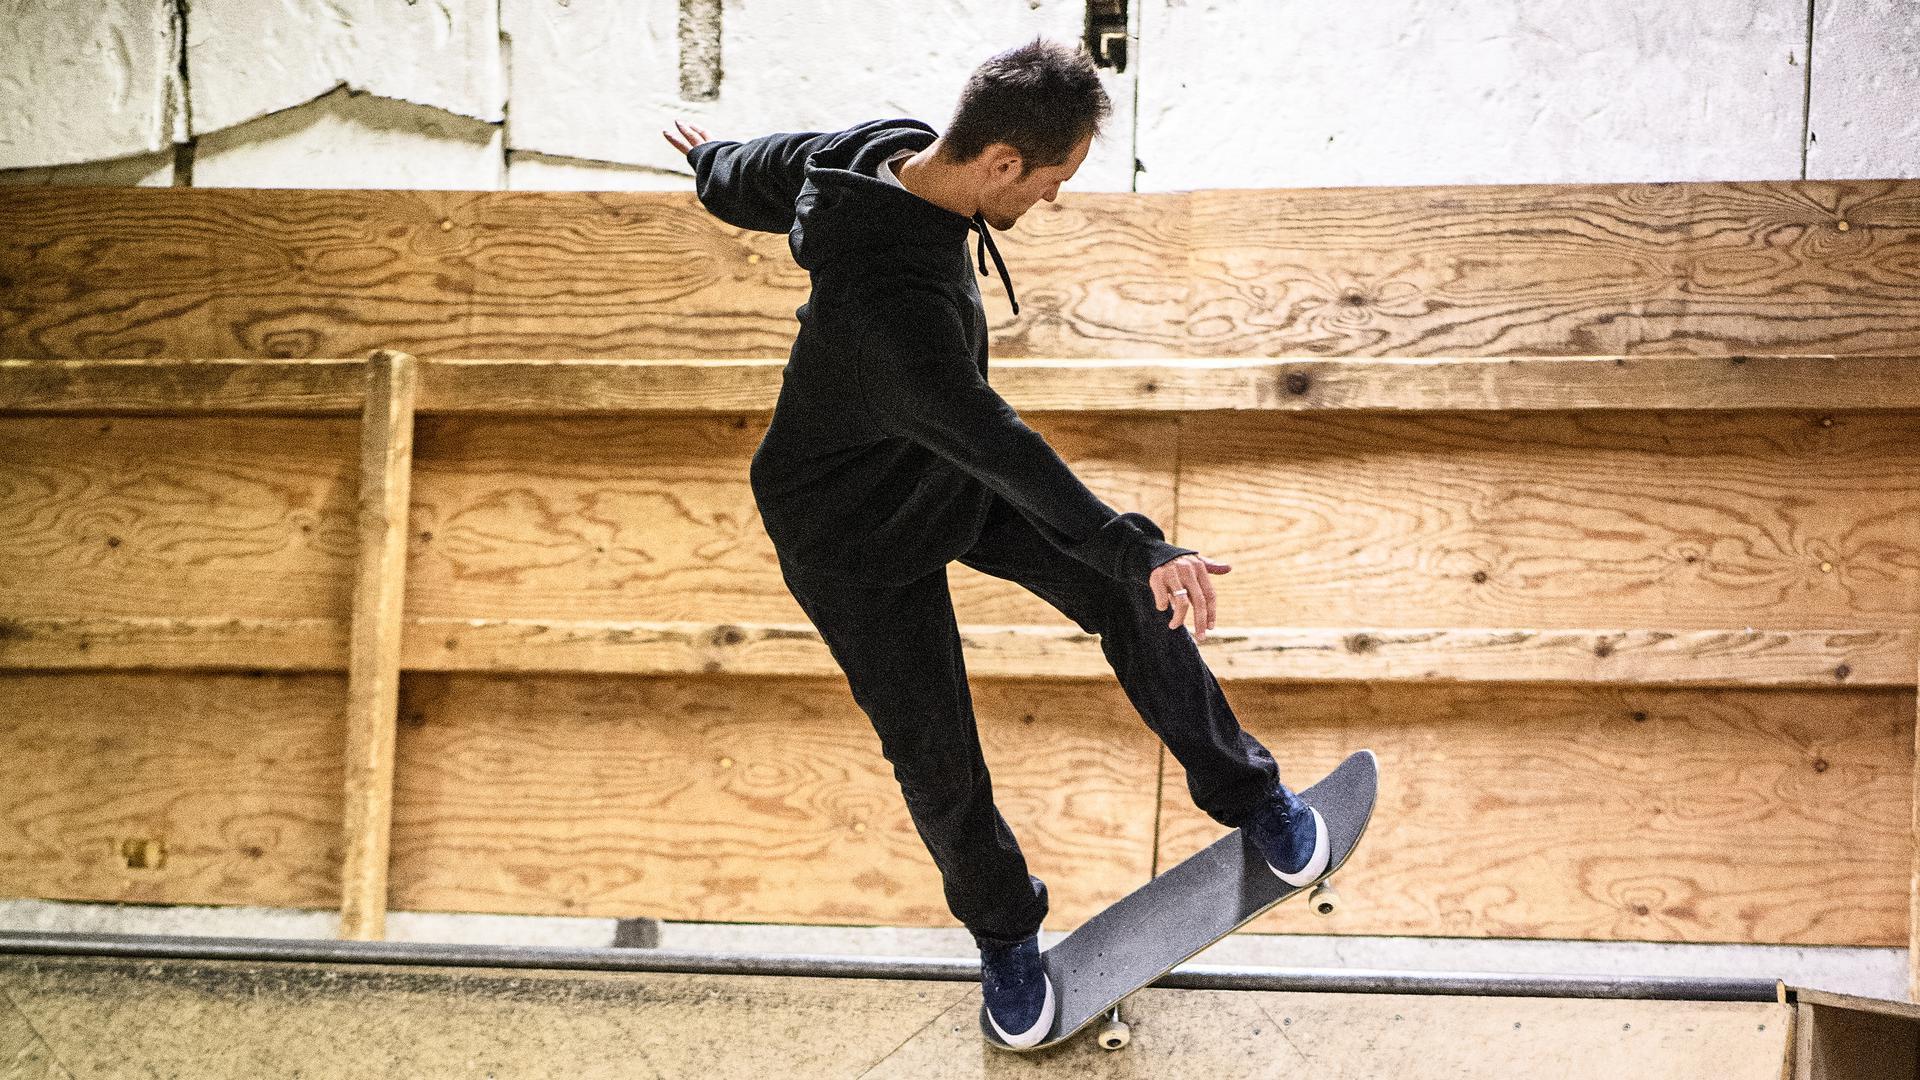 GES/ Skaten/ Alex Mizurov, Skateboarder,  09.01.2020